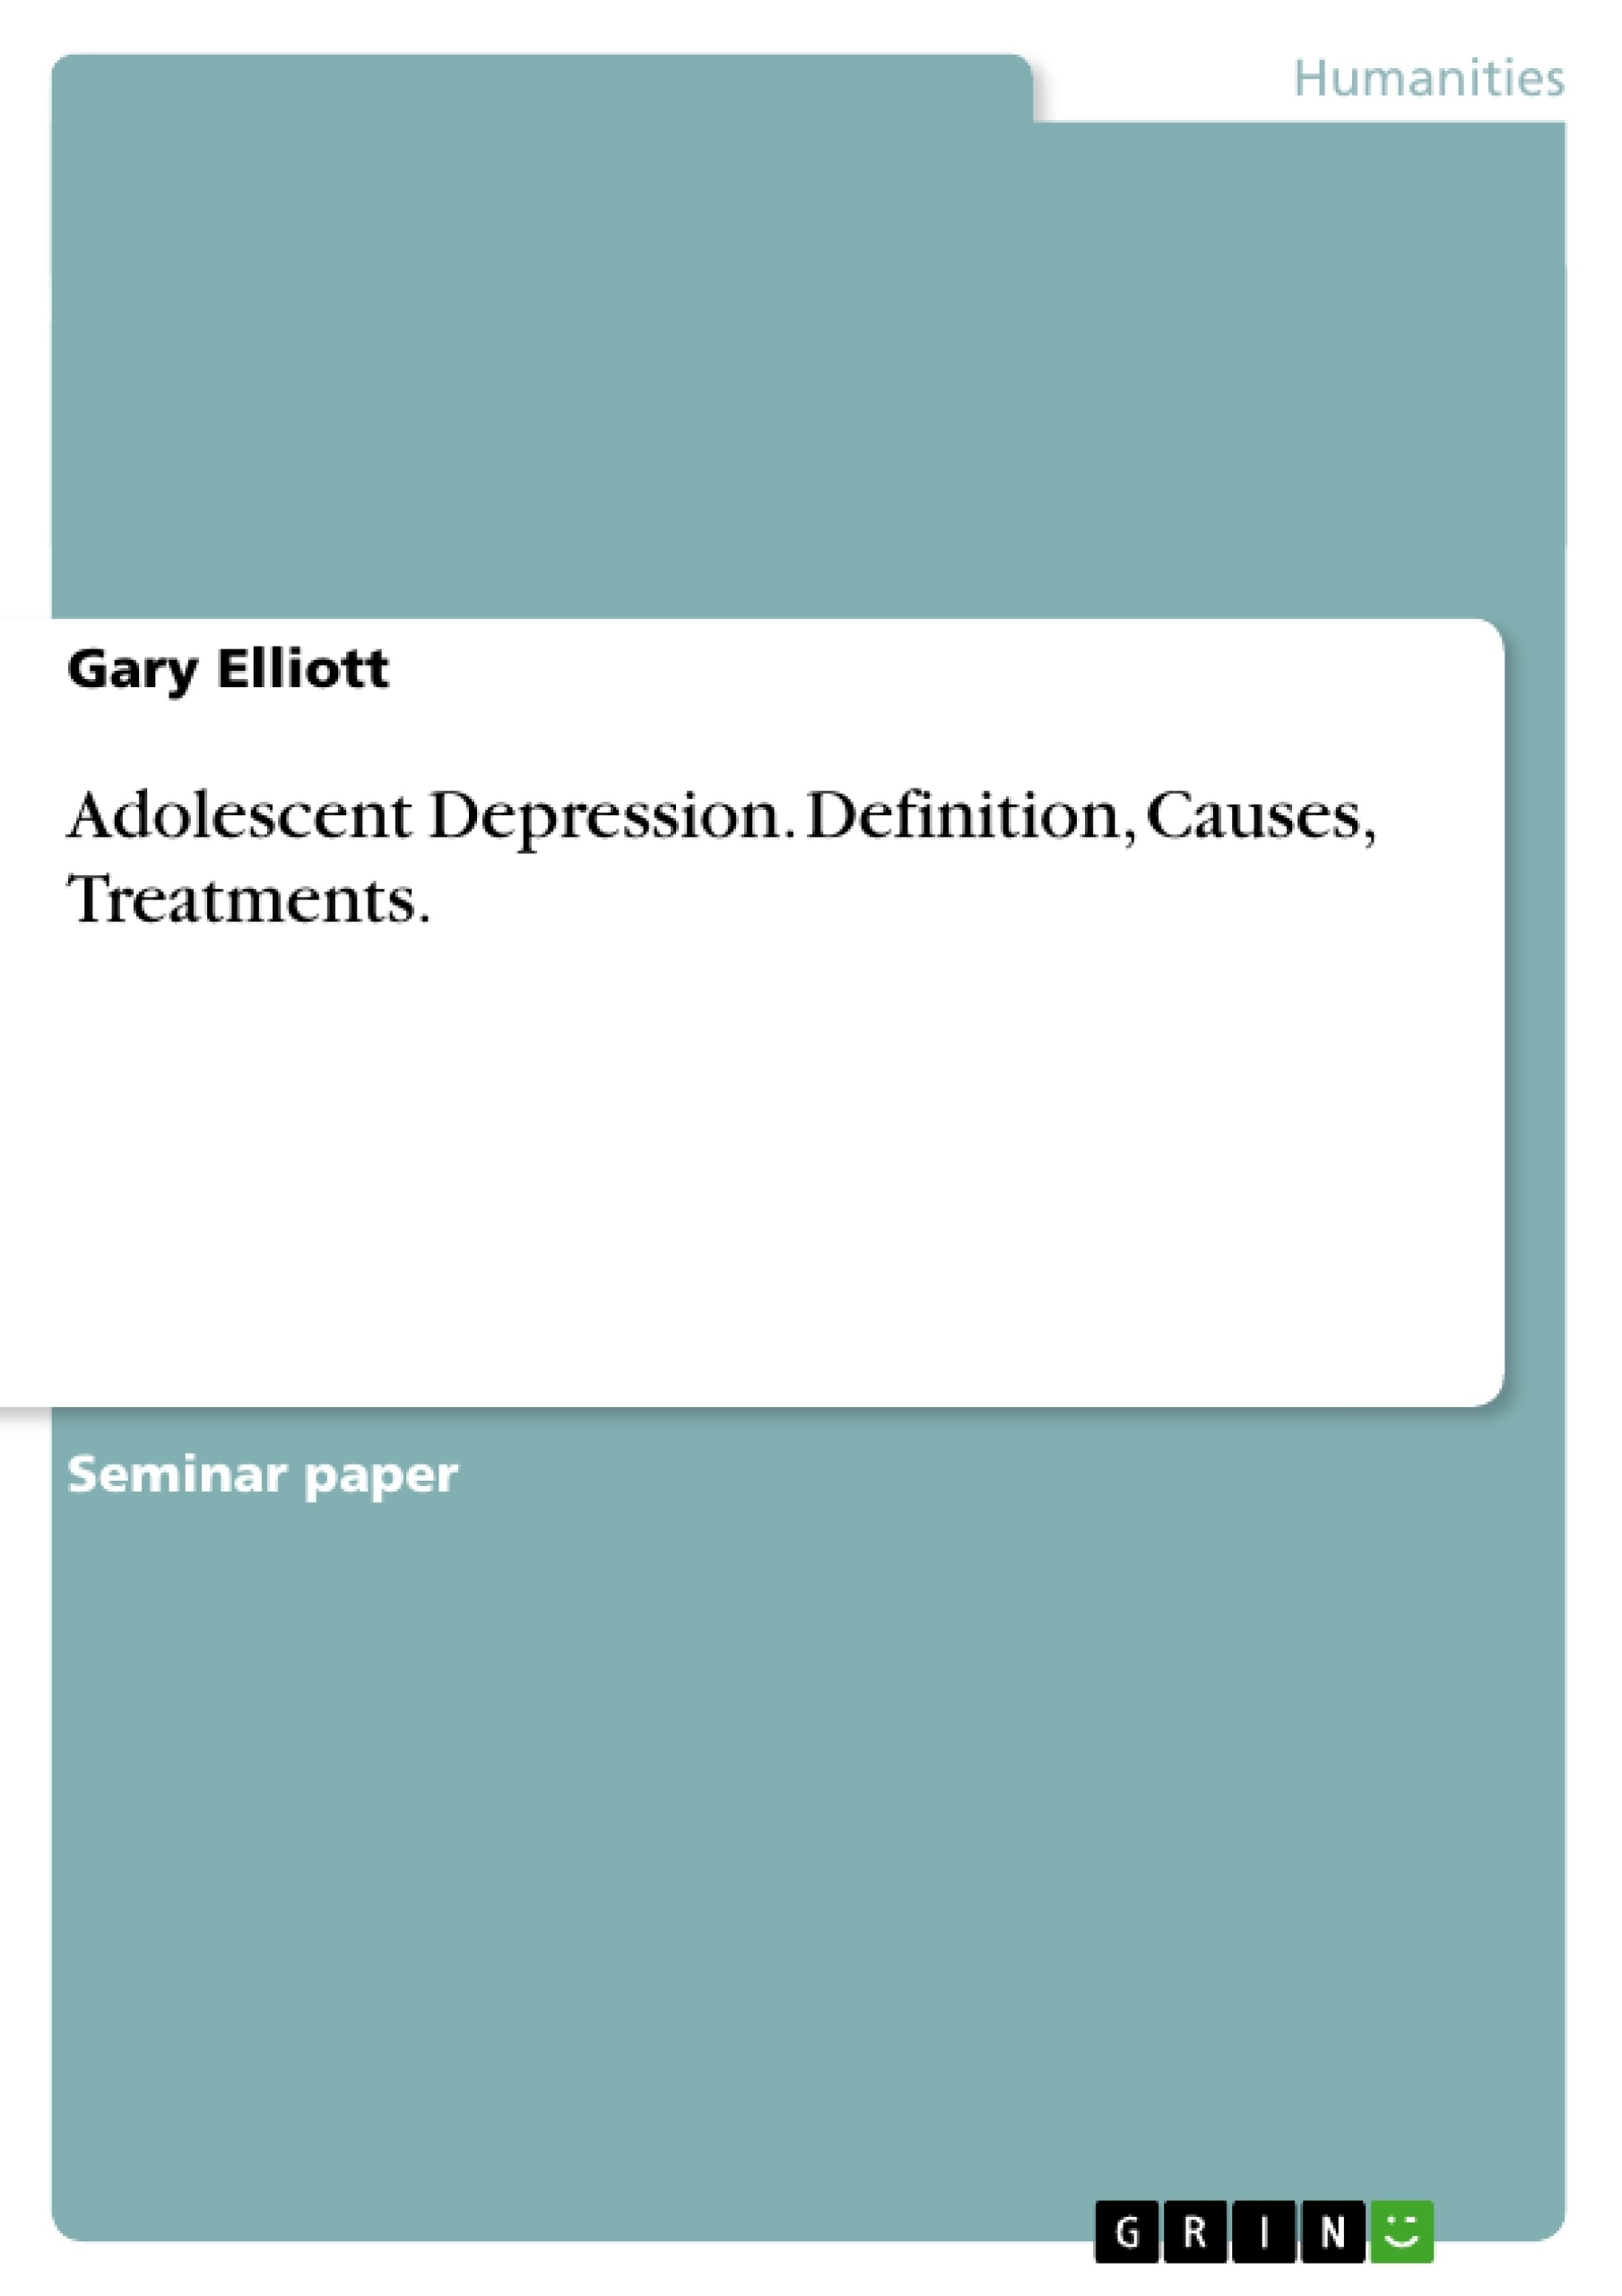 Title: Adolescent Depression. Definition, Causes, Treatments.